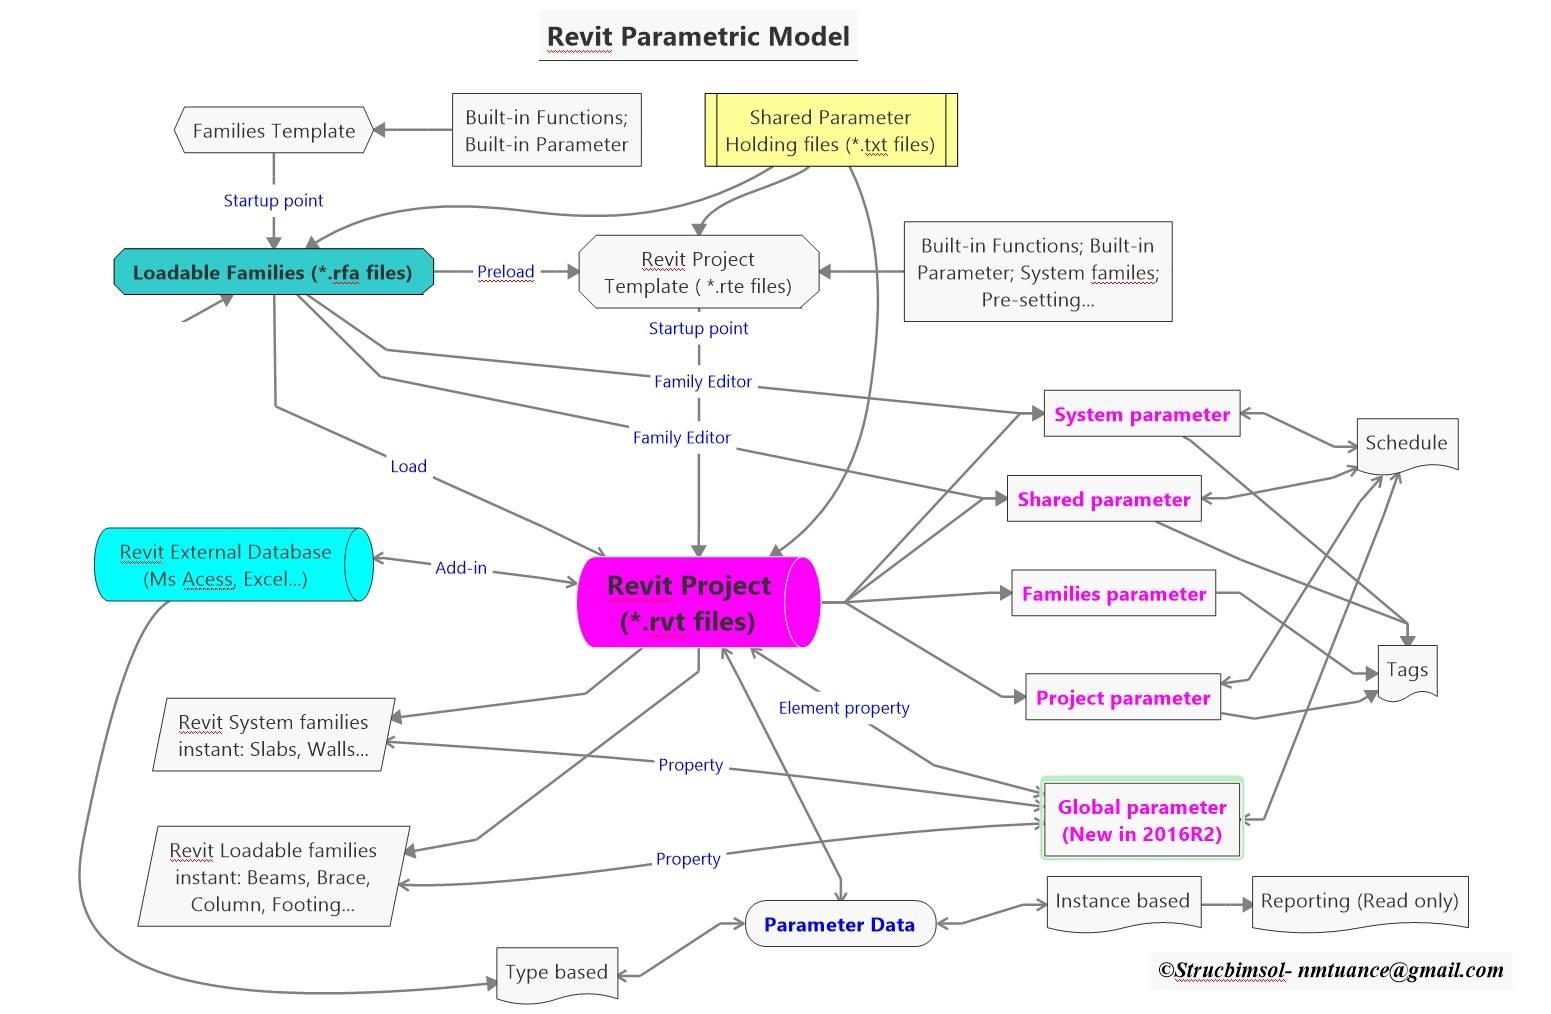 Strucbimsol_Revit_parametric_model